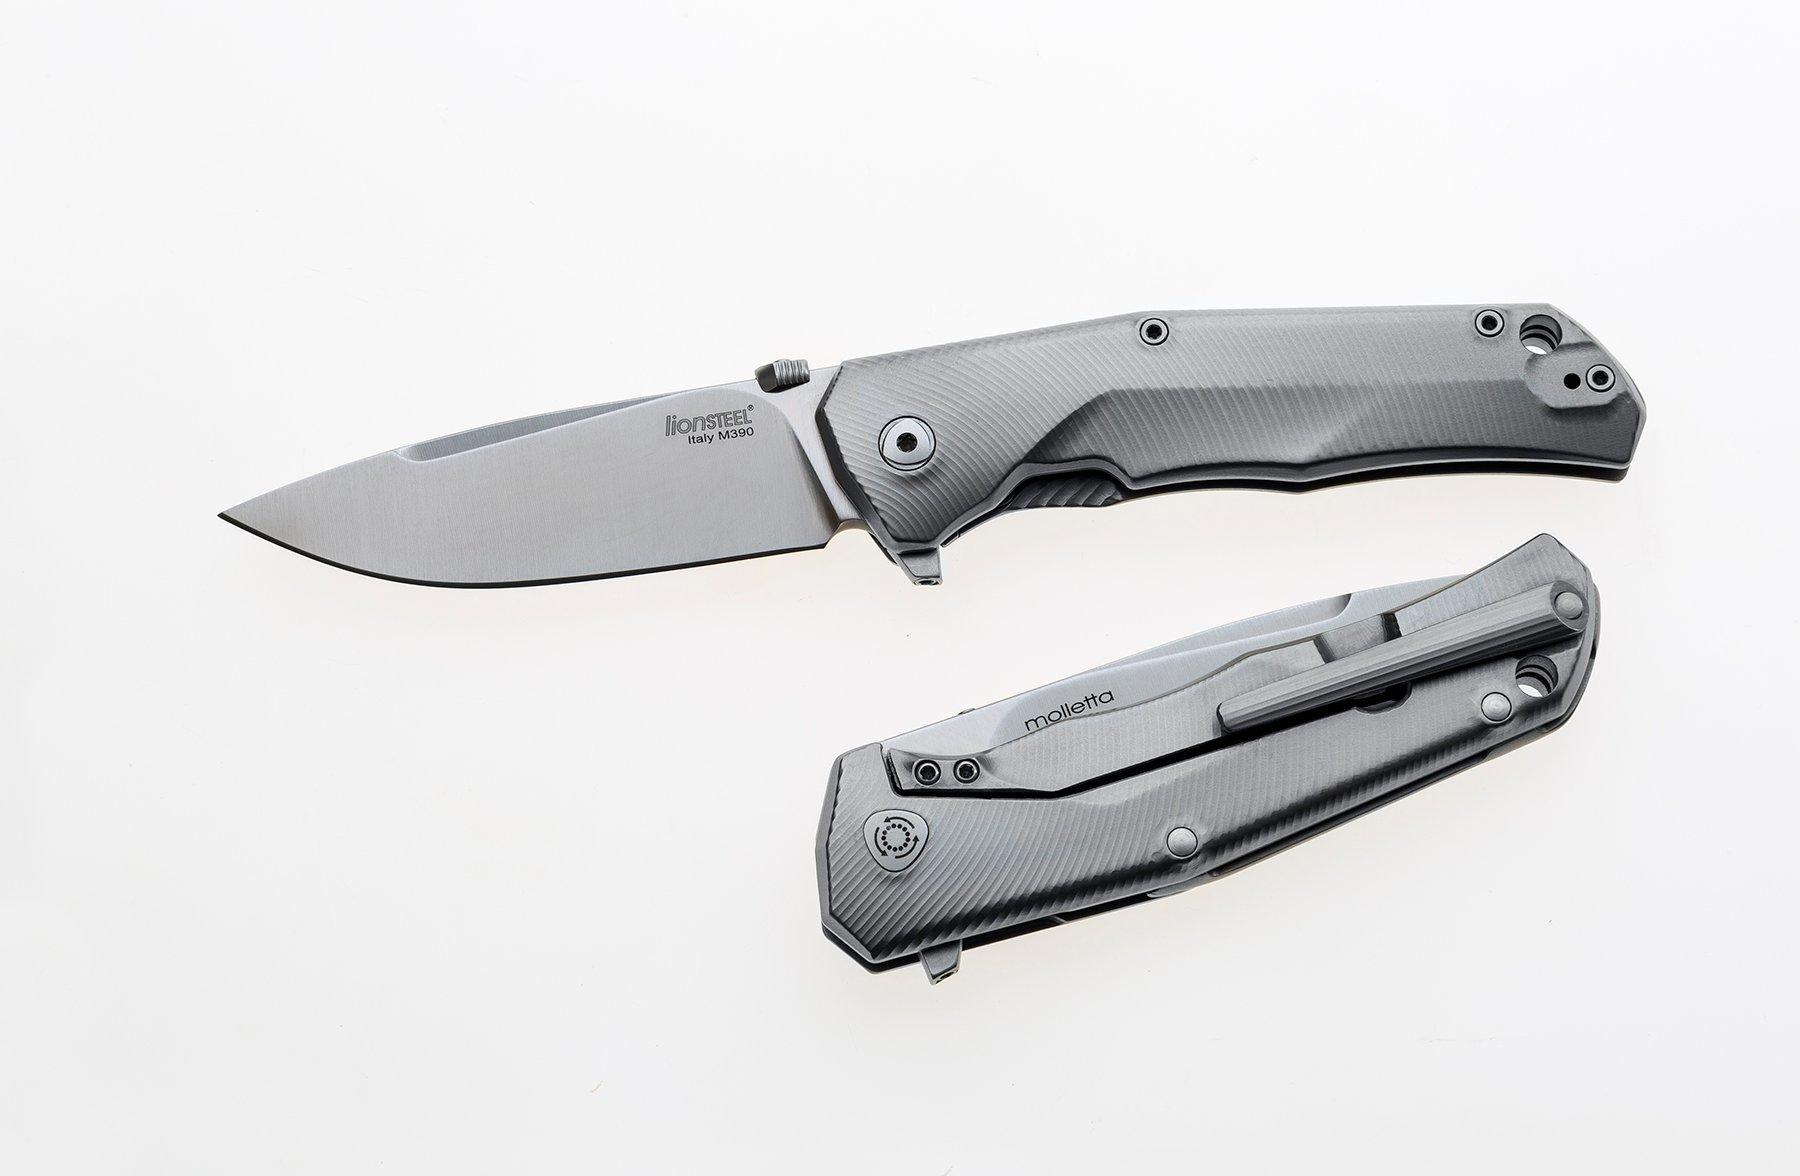 Фото 4 - Нож складной T.R.E. GY - Three Rapid Exchange (IKBS® Flipper), Matte Titanium Handles, Gray Accents от Lion Steel